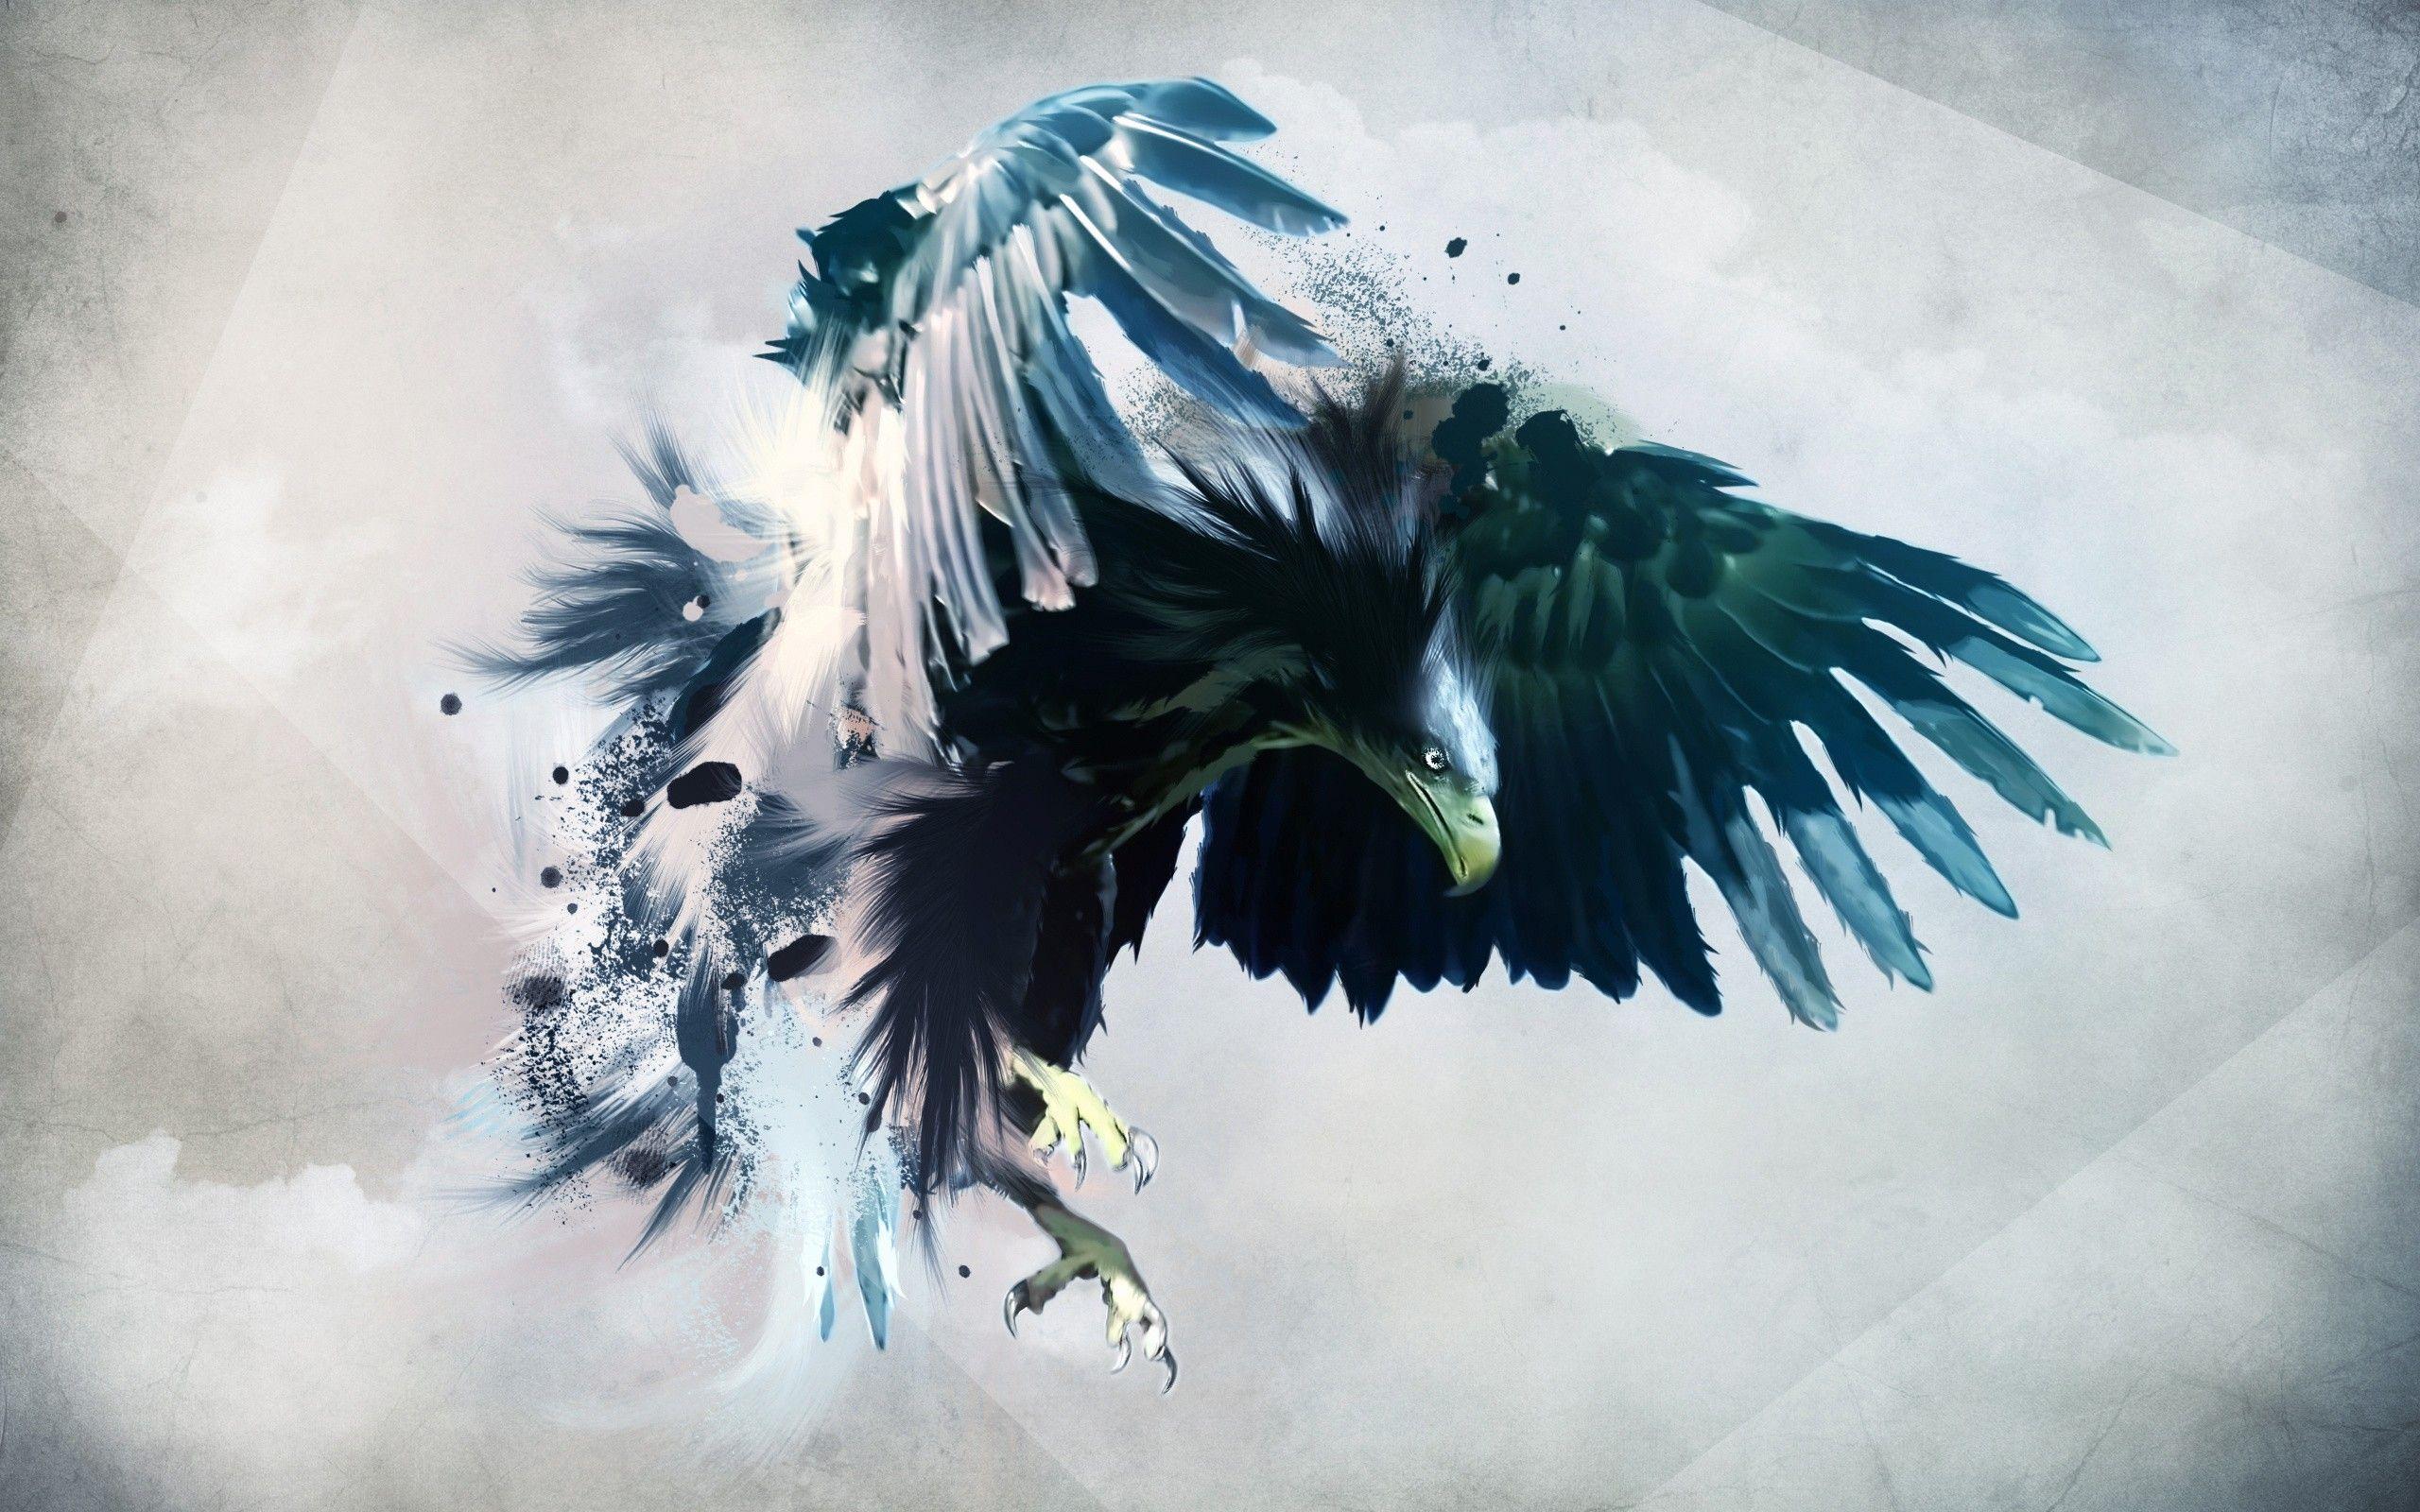 Eagle Hd Wallpaper